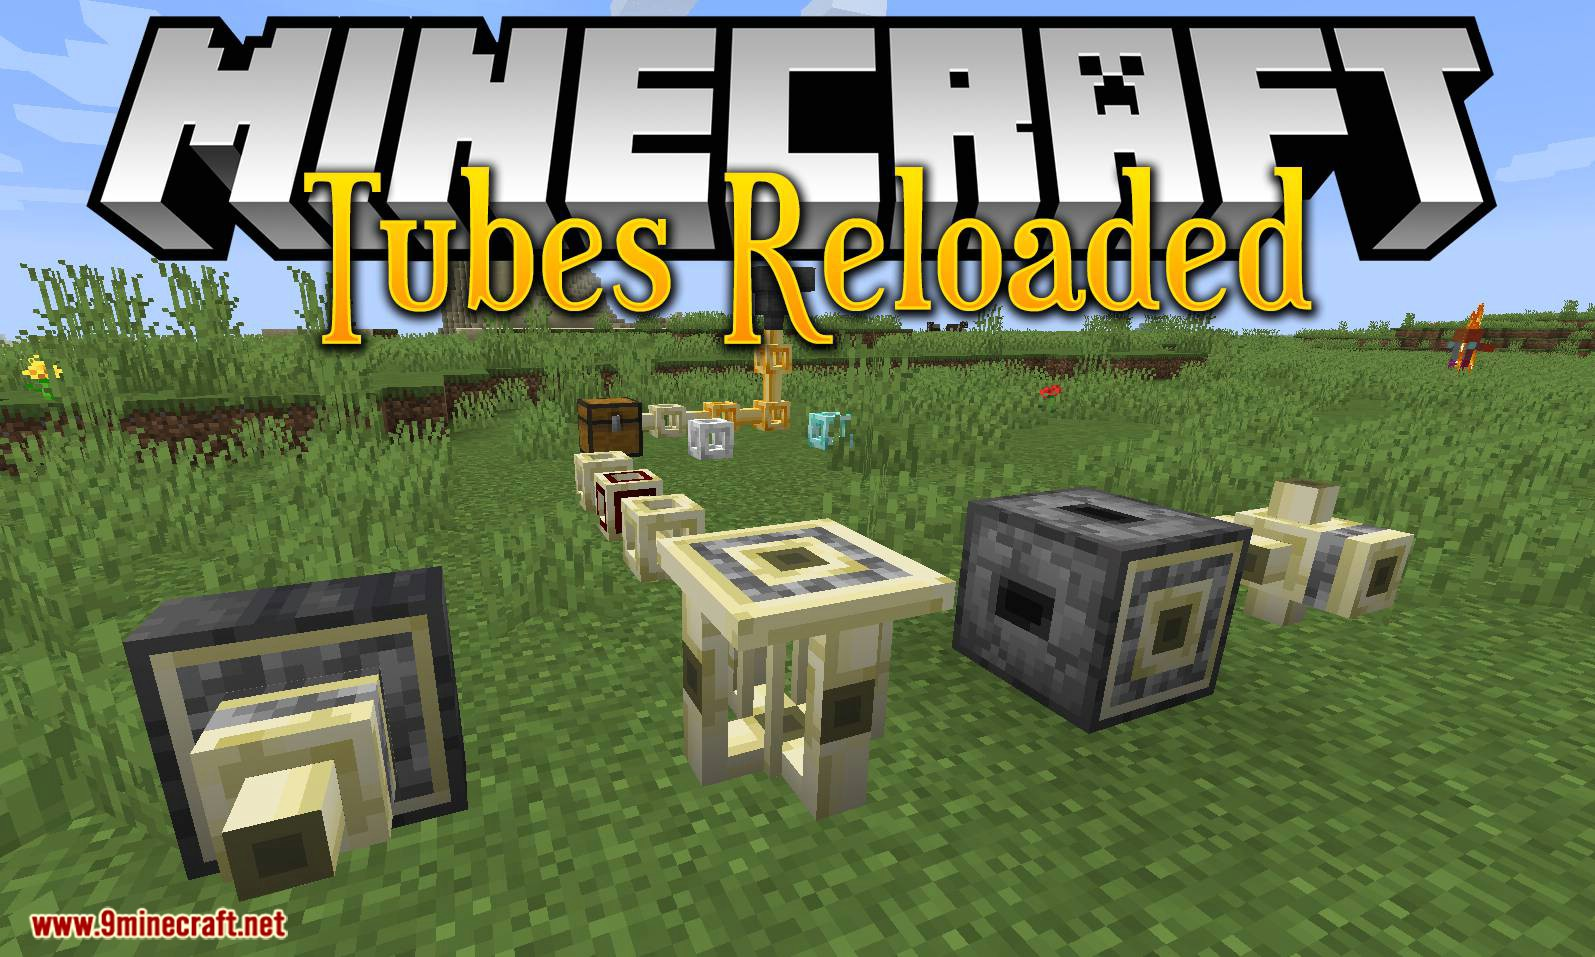 Tubes Reloaded mod for minecraft logo